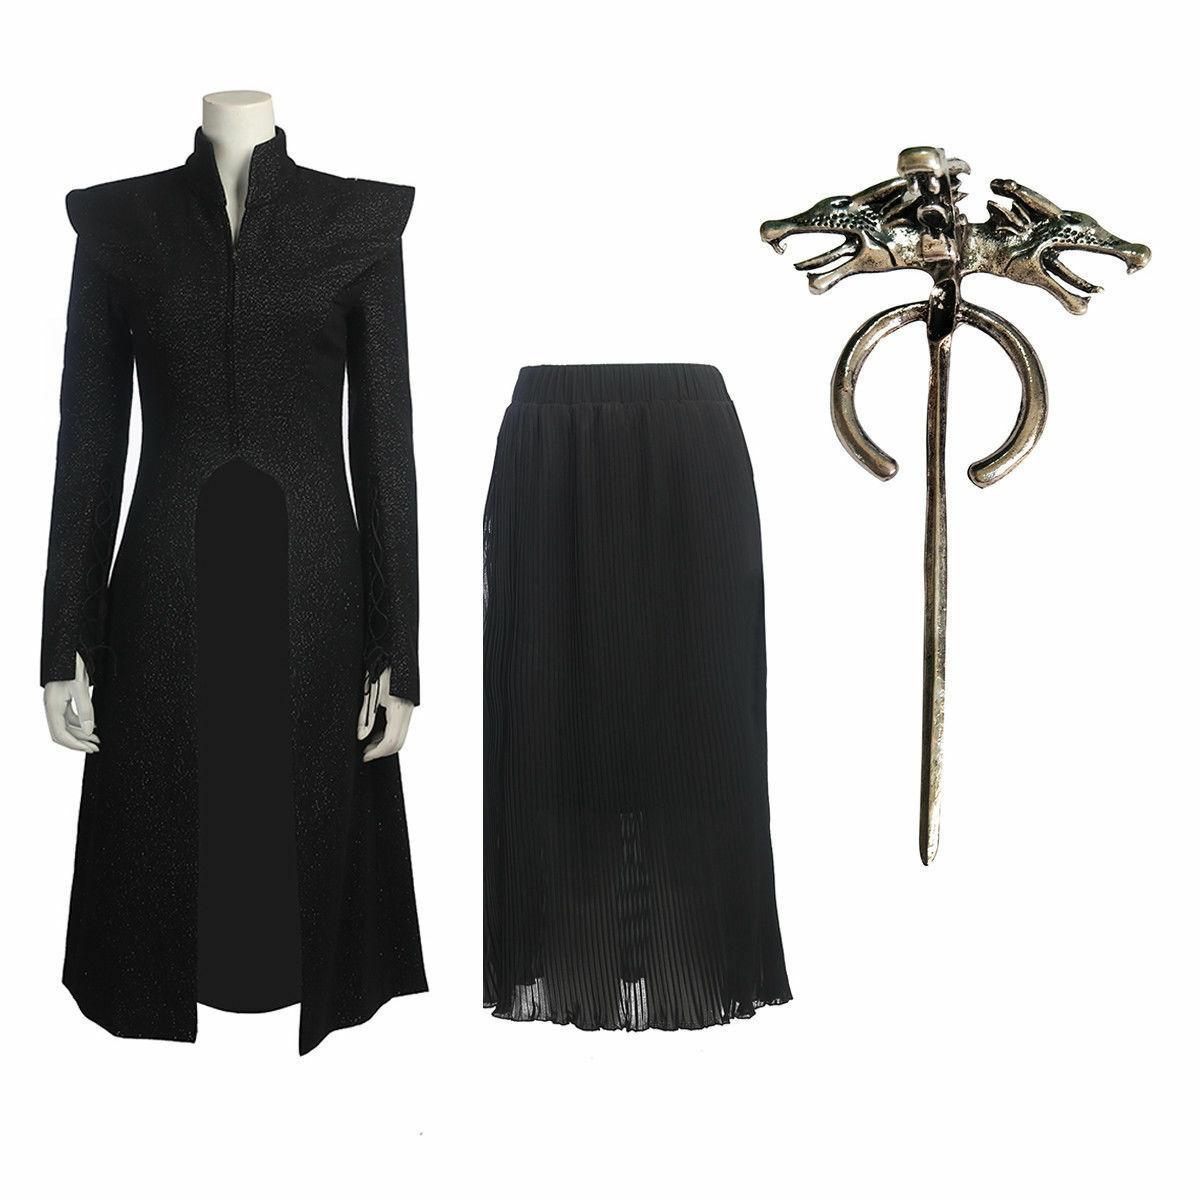 Daenerys Targaryen Mother of Dragons Cosplay Costume Game of Thrones Season 7 - $83.44